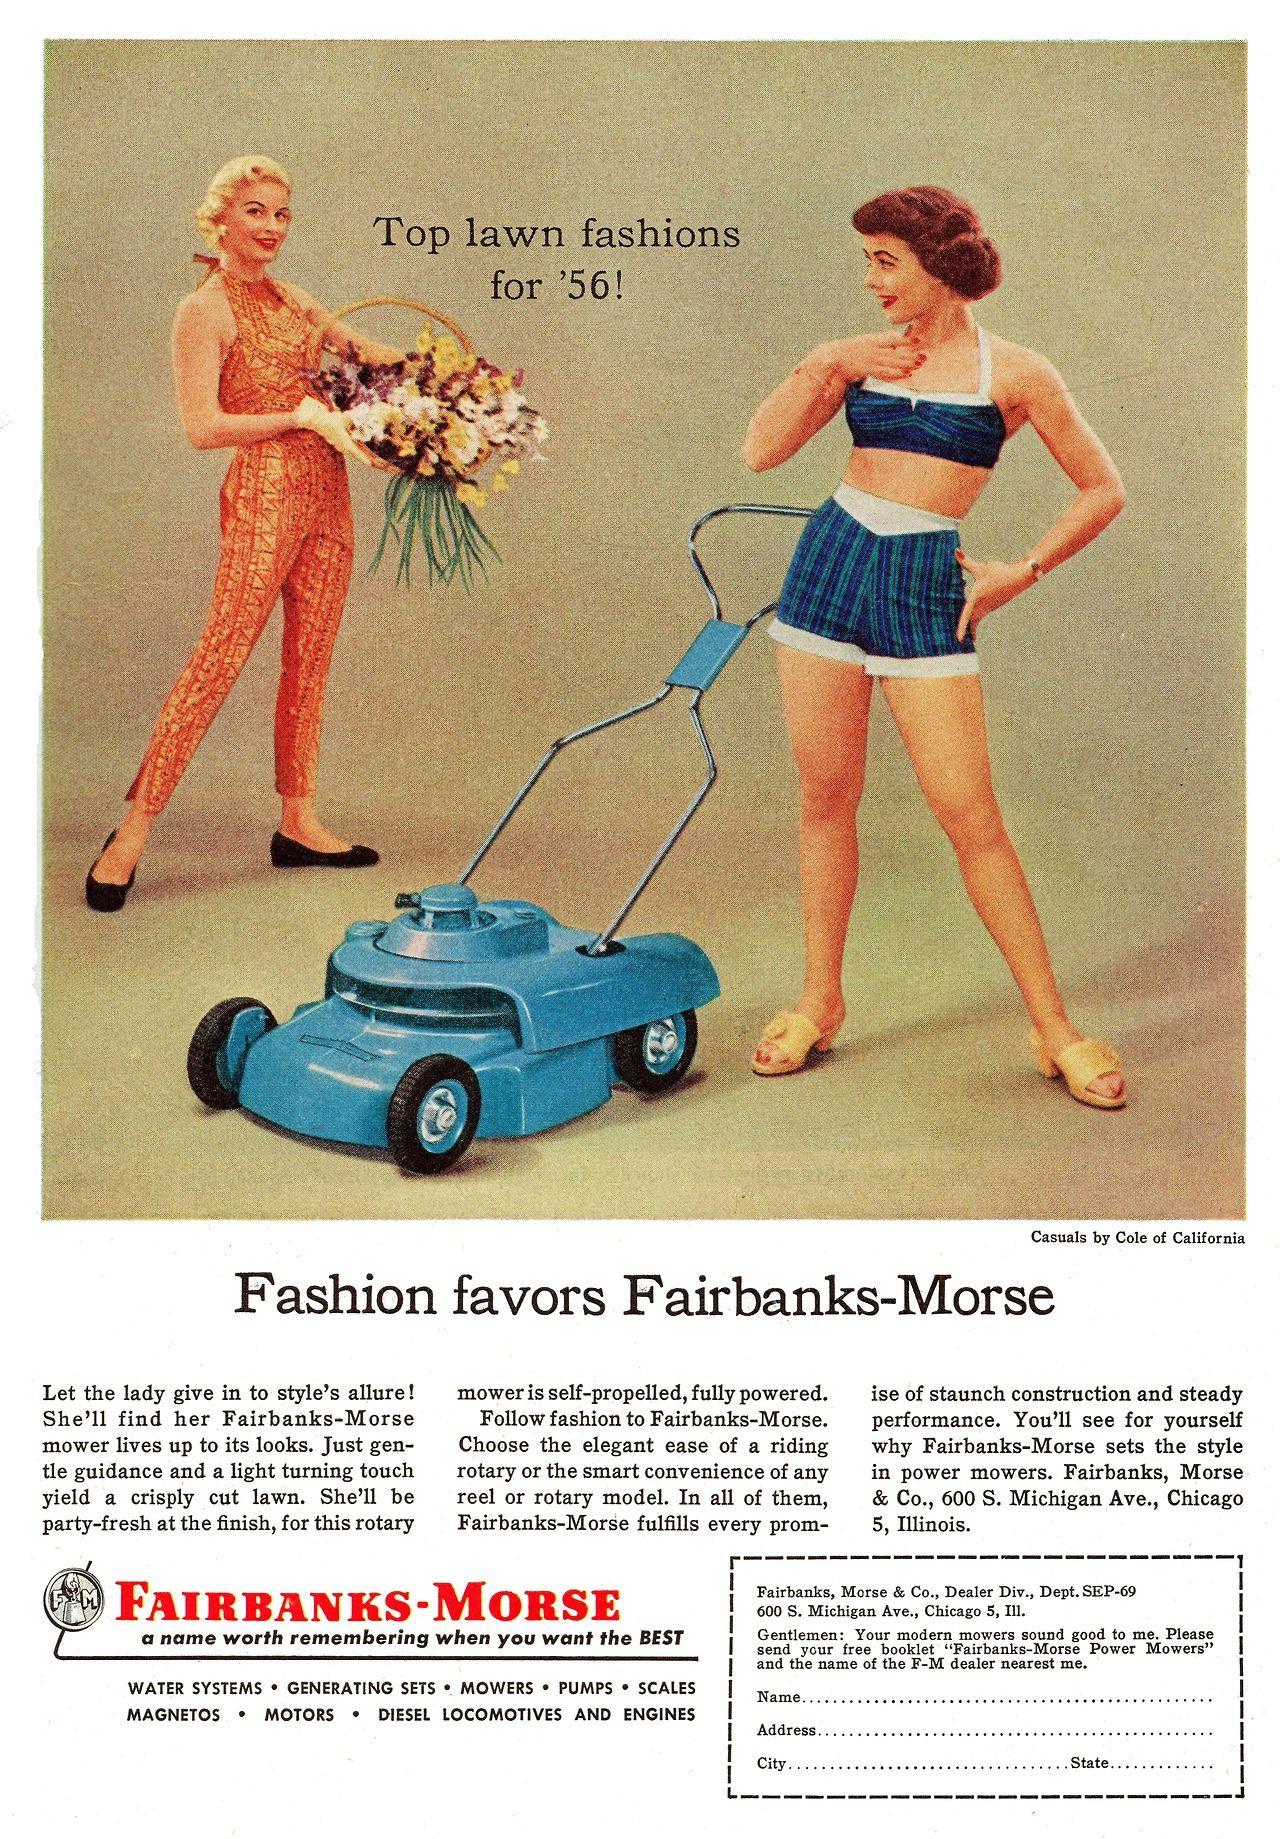 A Fashionable Lawn Mower By Fairbanks Morse 1956 Retro